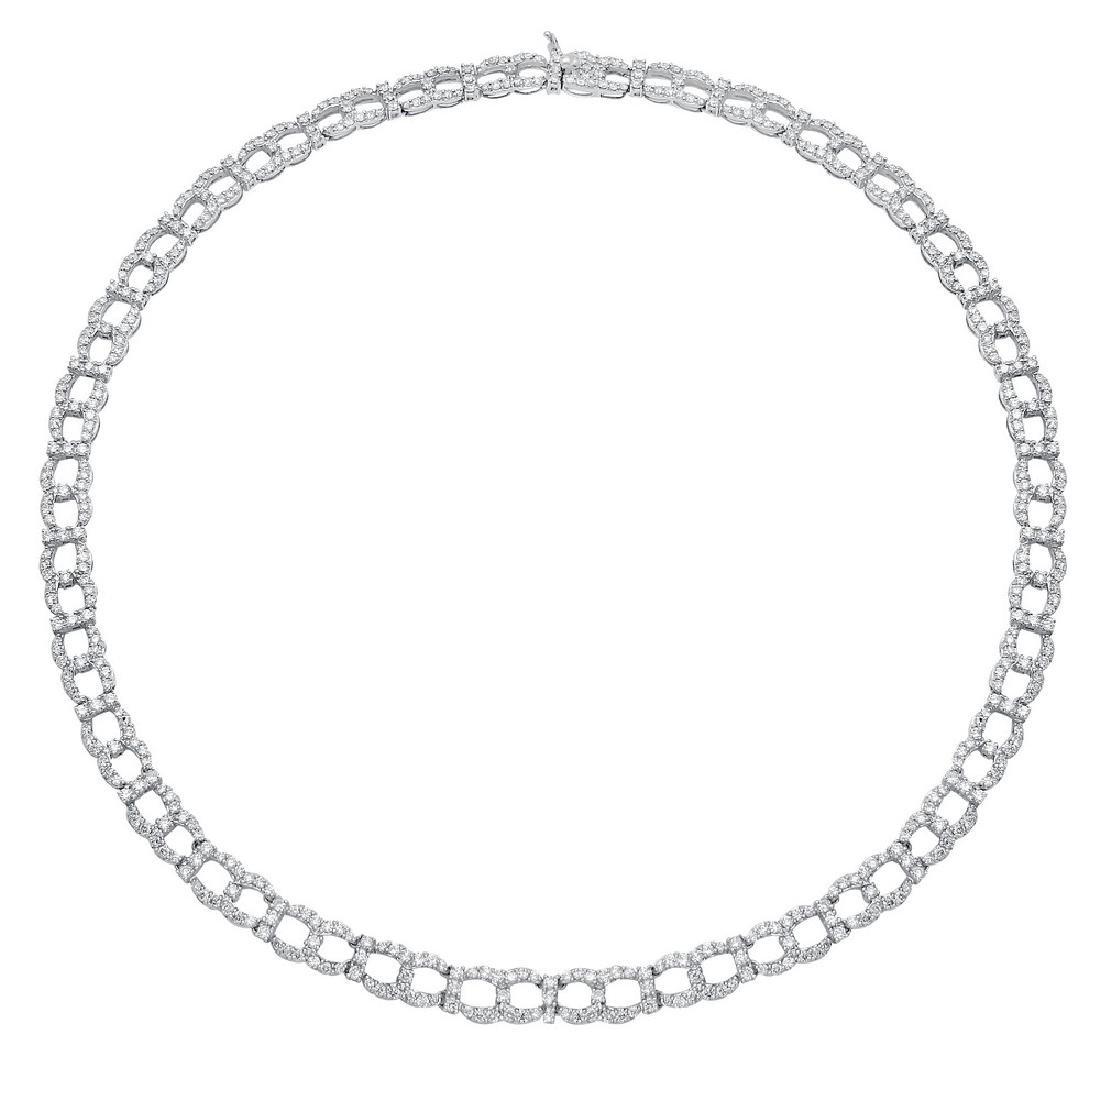 18K White Gold 10.46 CTW Diamond Necklace